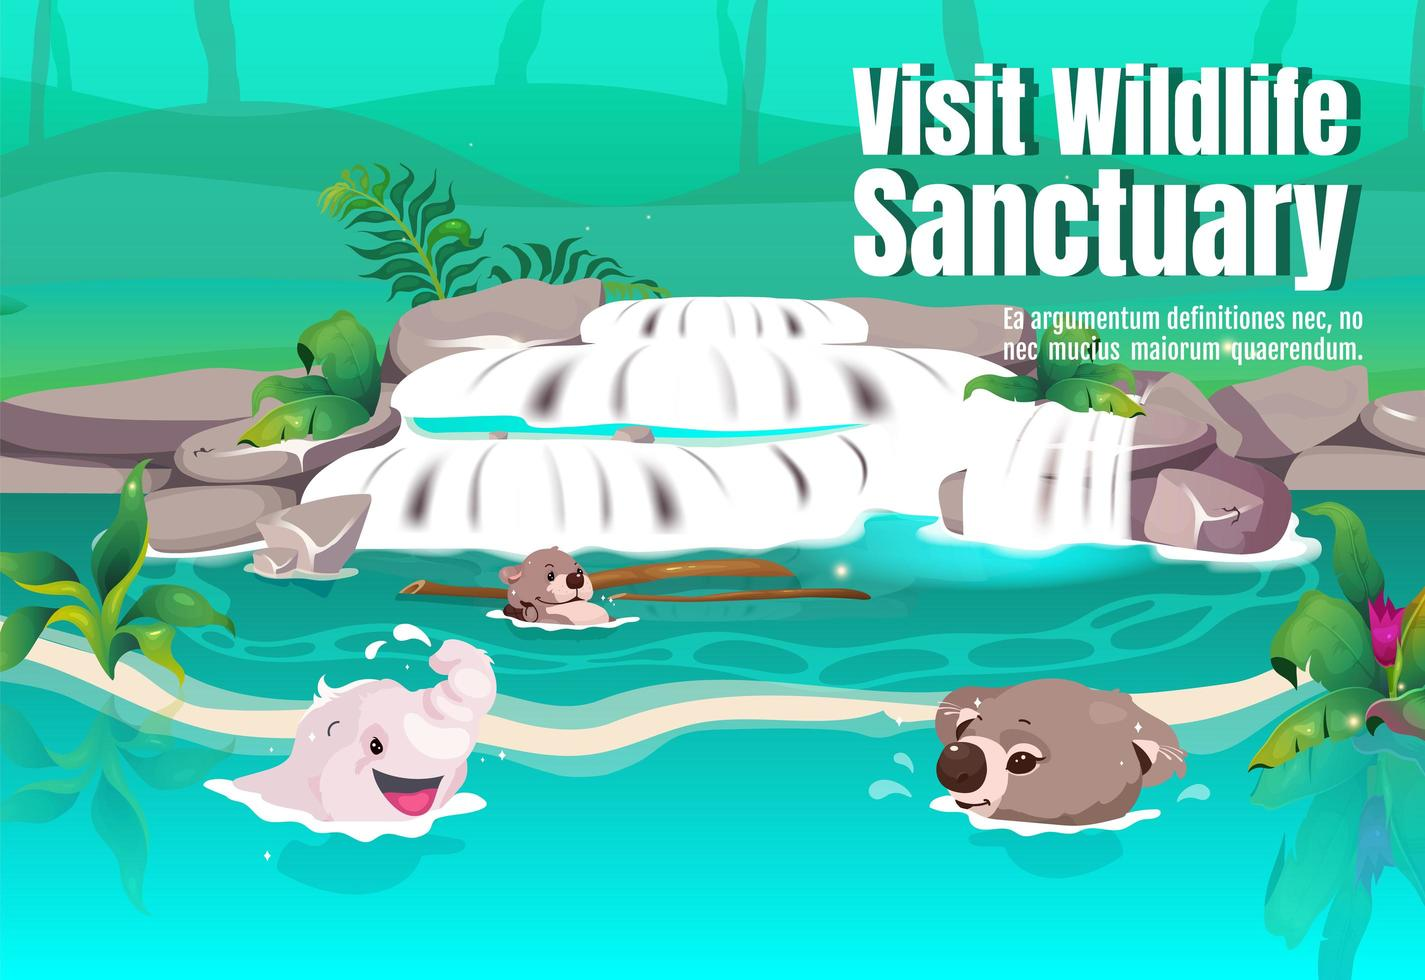 besök djurreservat affisch vektor